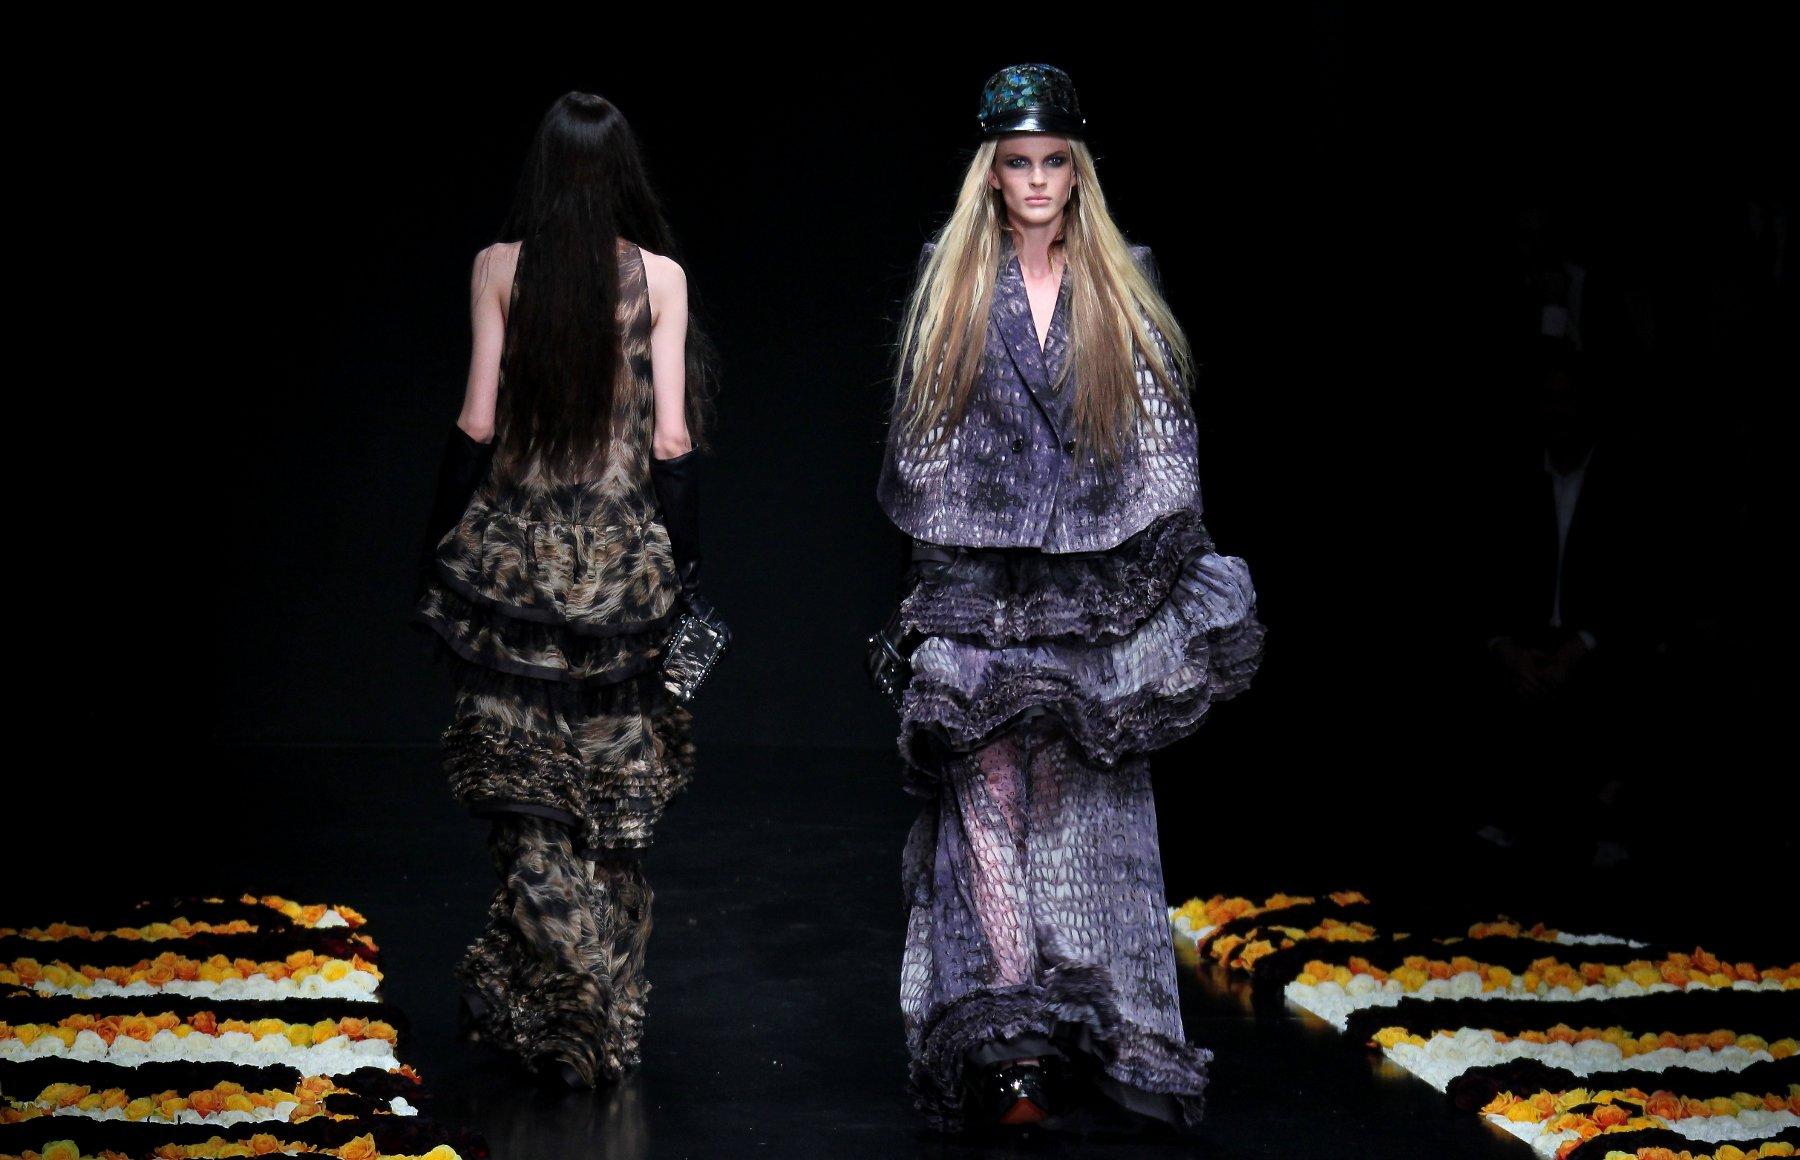 Catwalk Roberto Cavalli Fall Winter 2012-2013 Women Collection Fashion Show Catwalk Milano Fashion Week